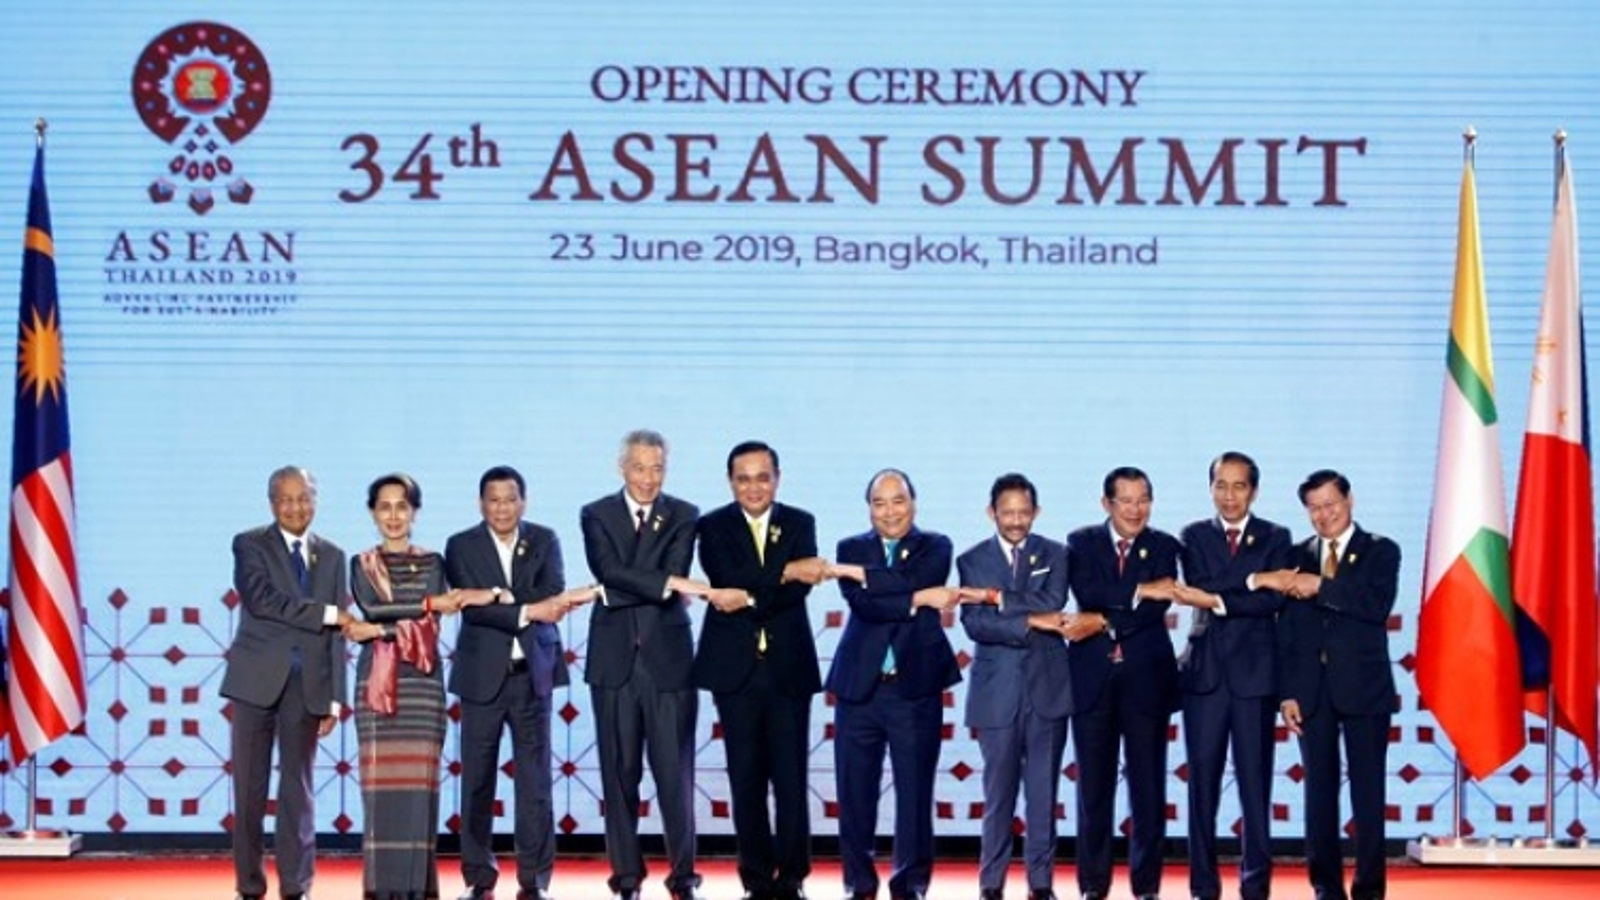 34th ASEAN Summit opened in Bangkok